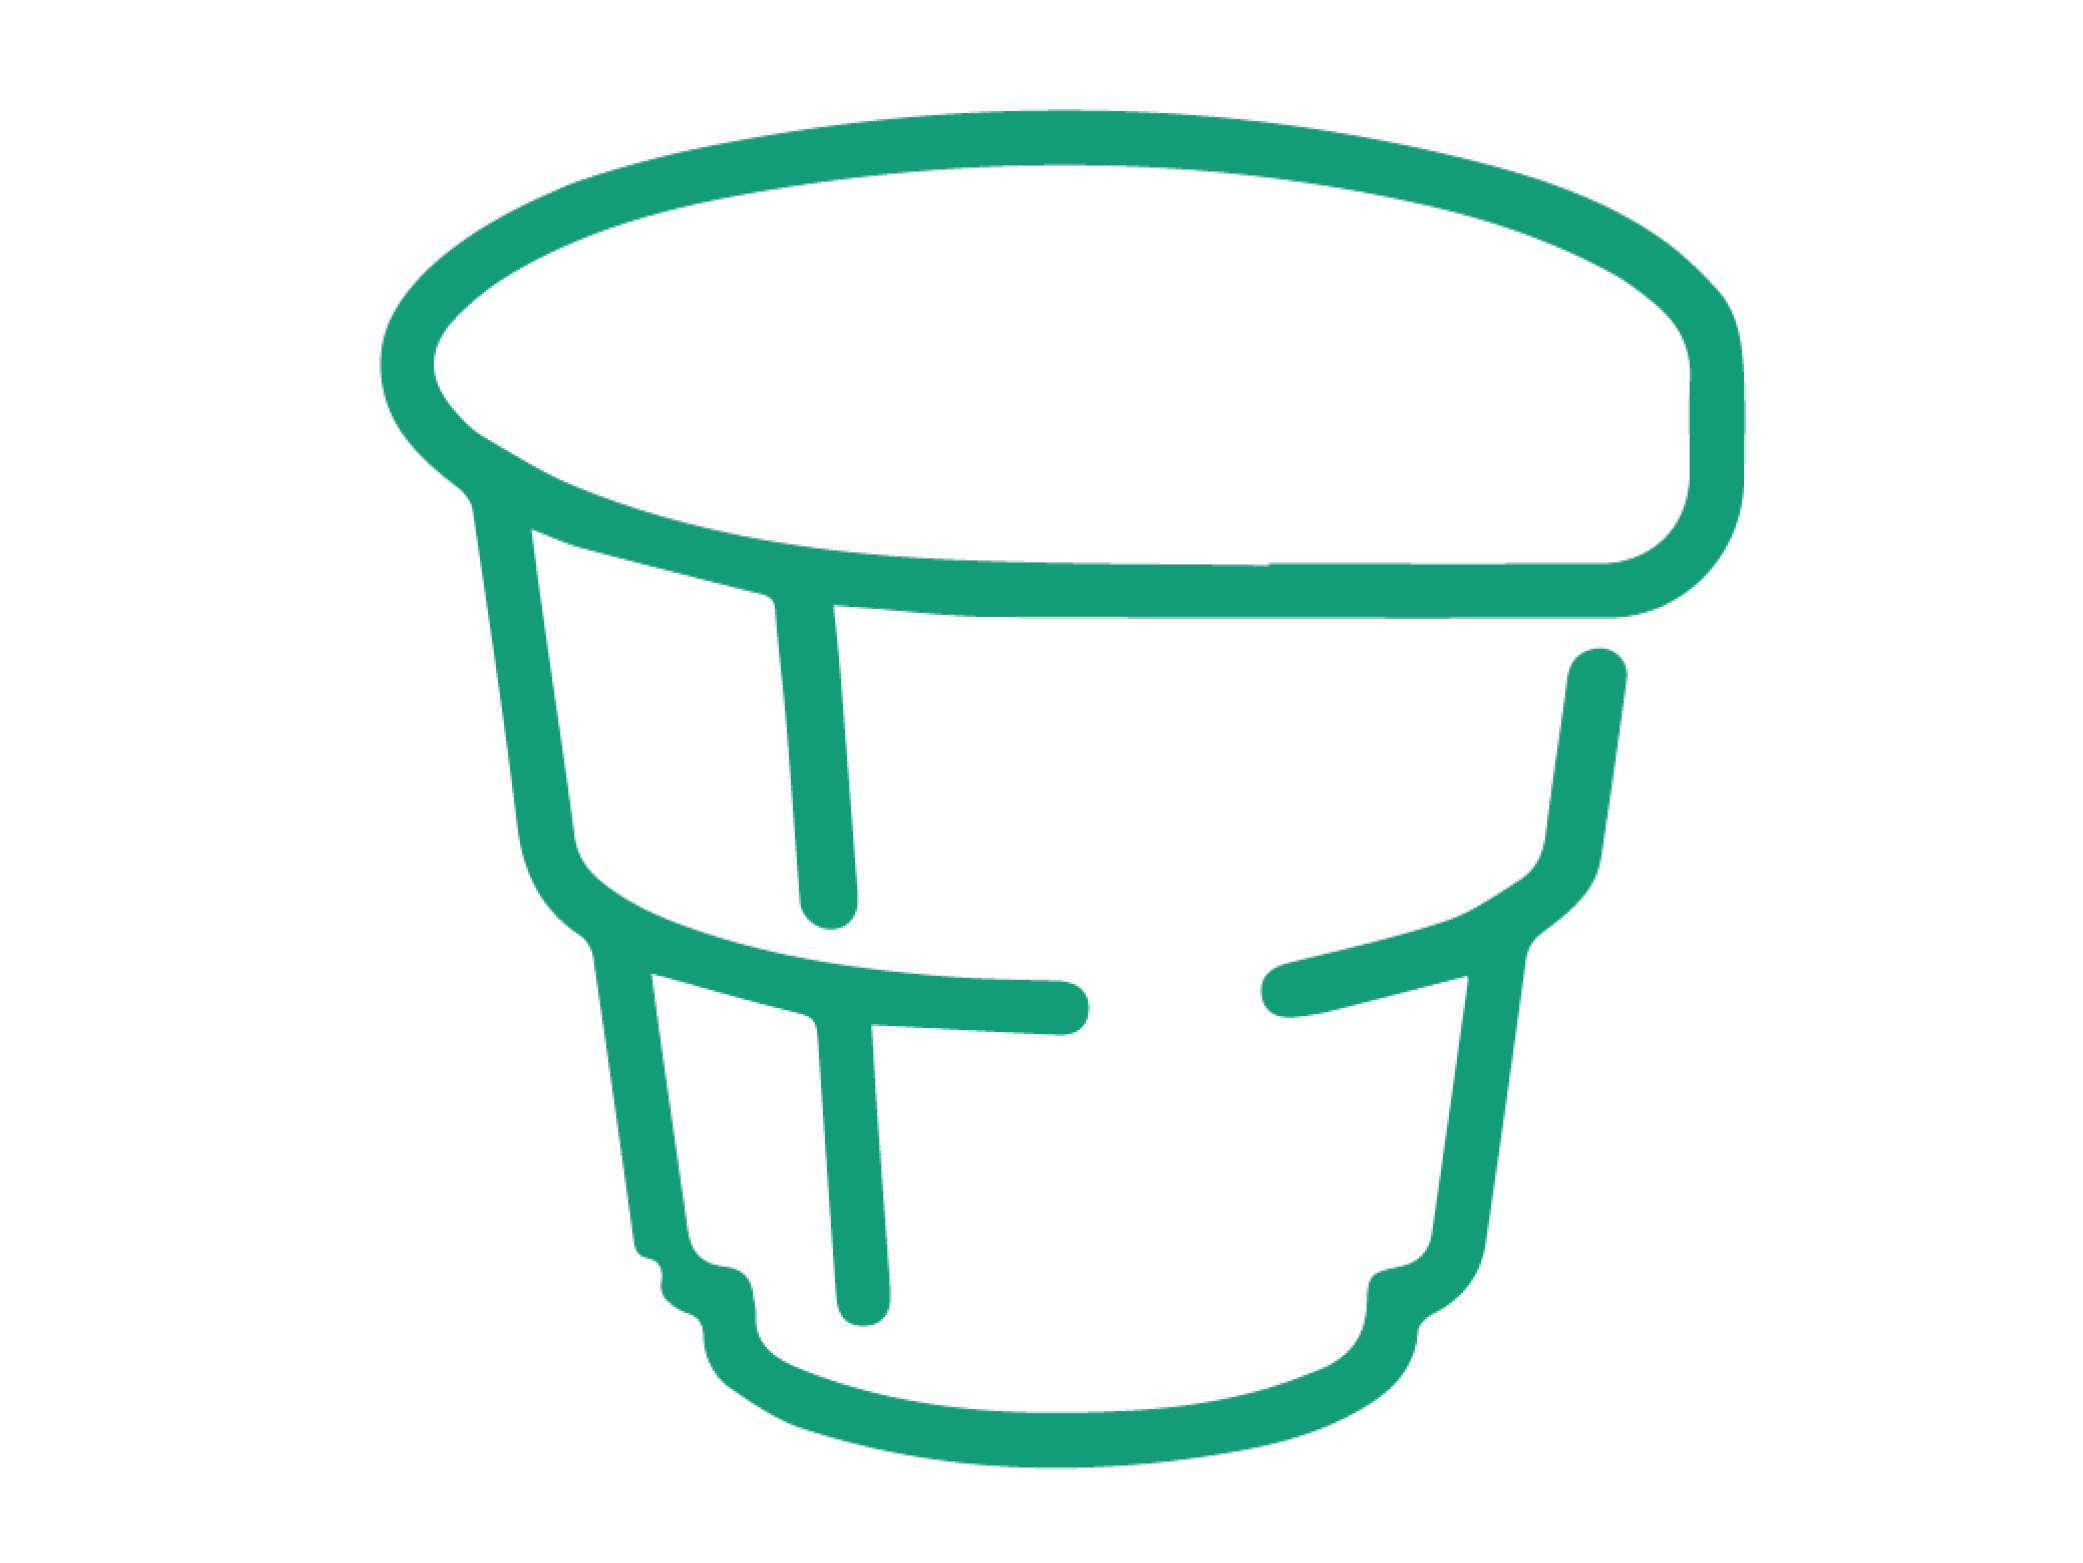 Cup tn